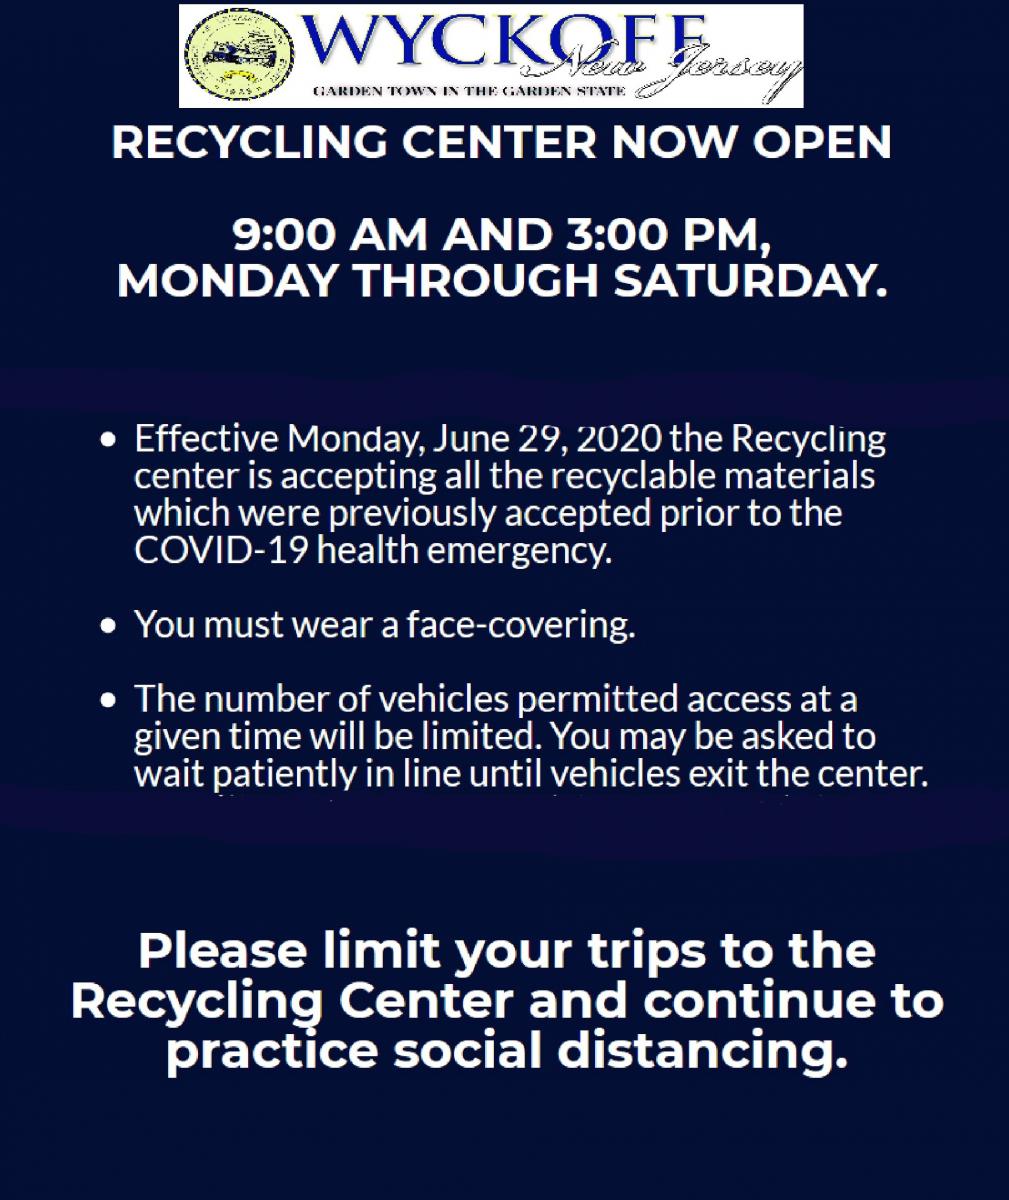 Recycling Center open 9-3